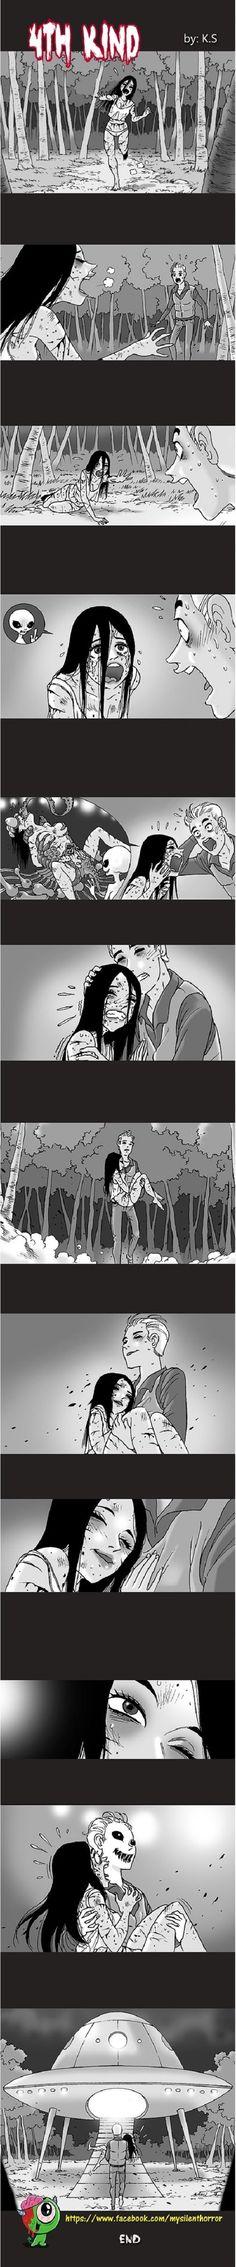 Repostuj.pl :: mysilenthorror-creepy-komiks